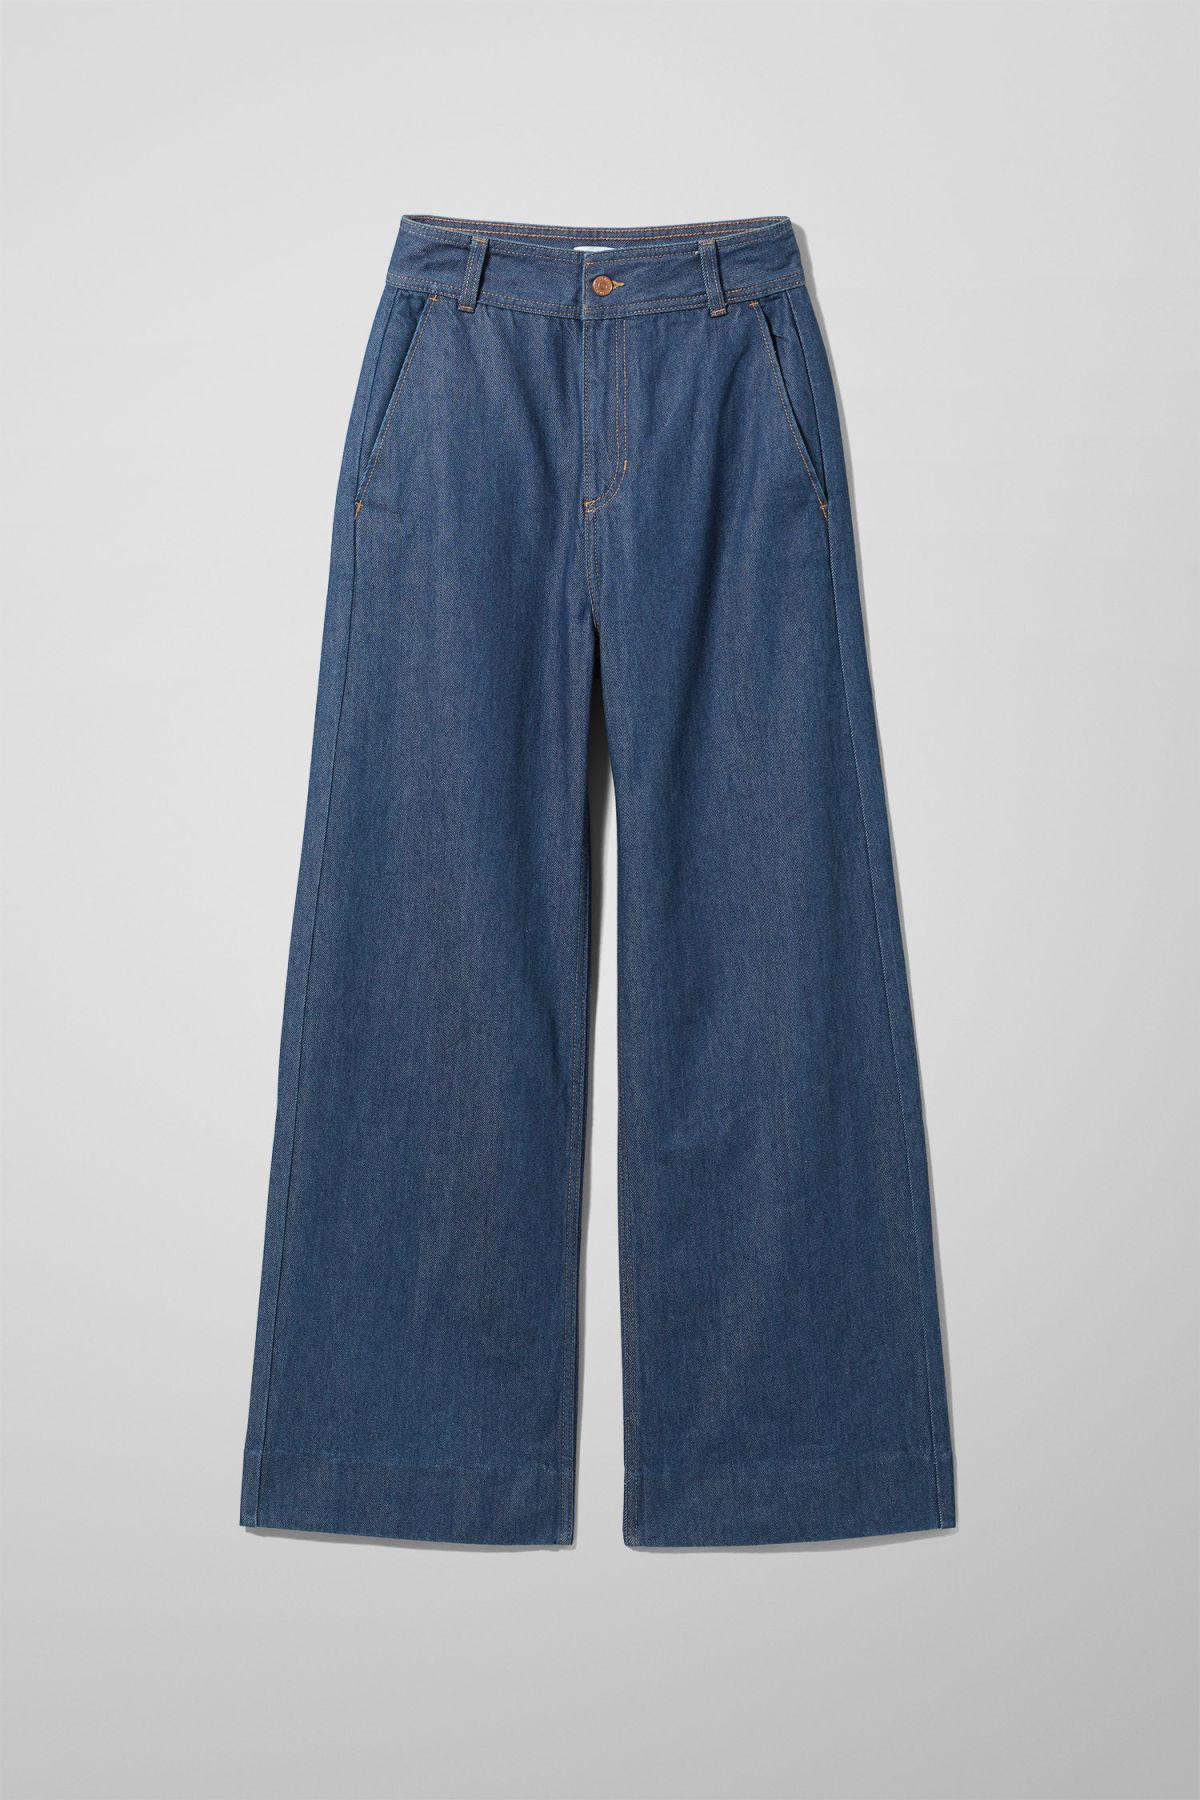 Cory Denim Trousers - Blue-34